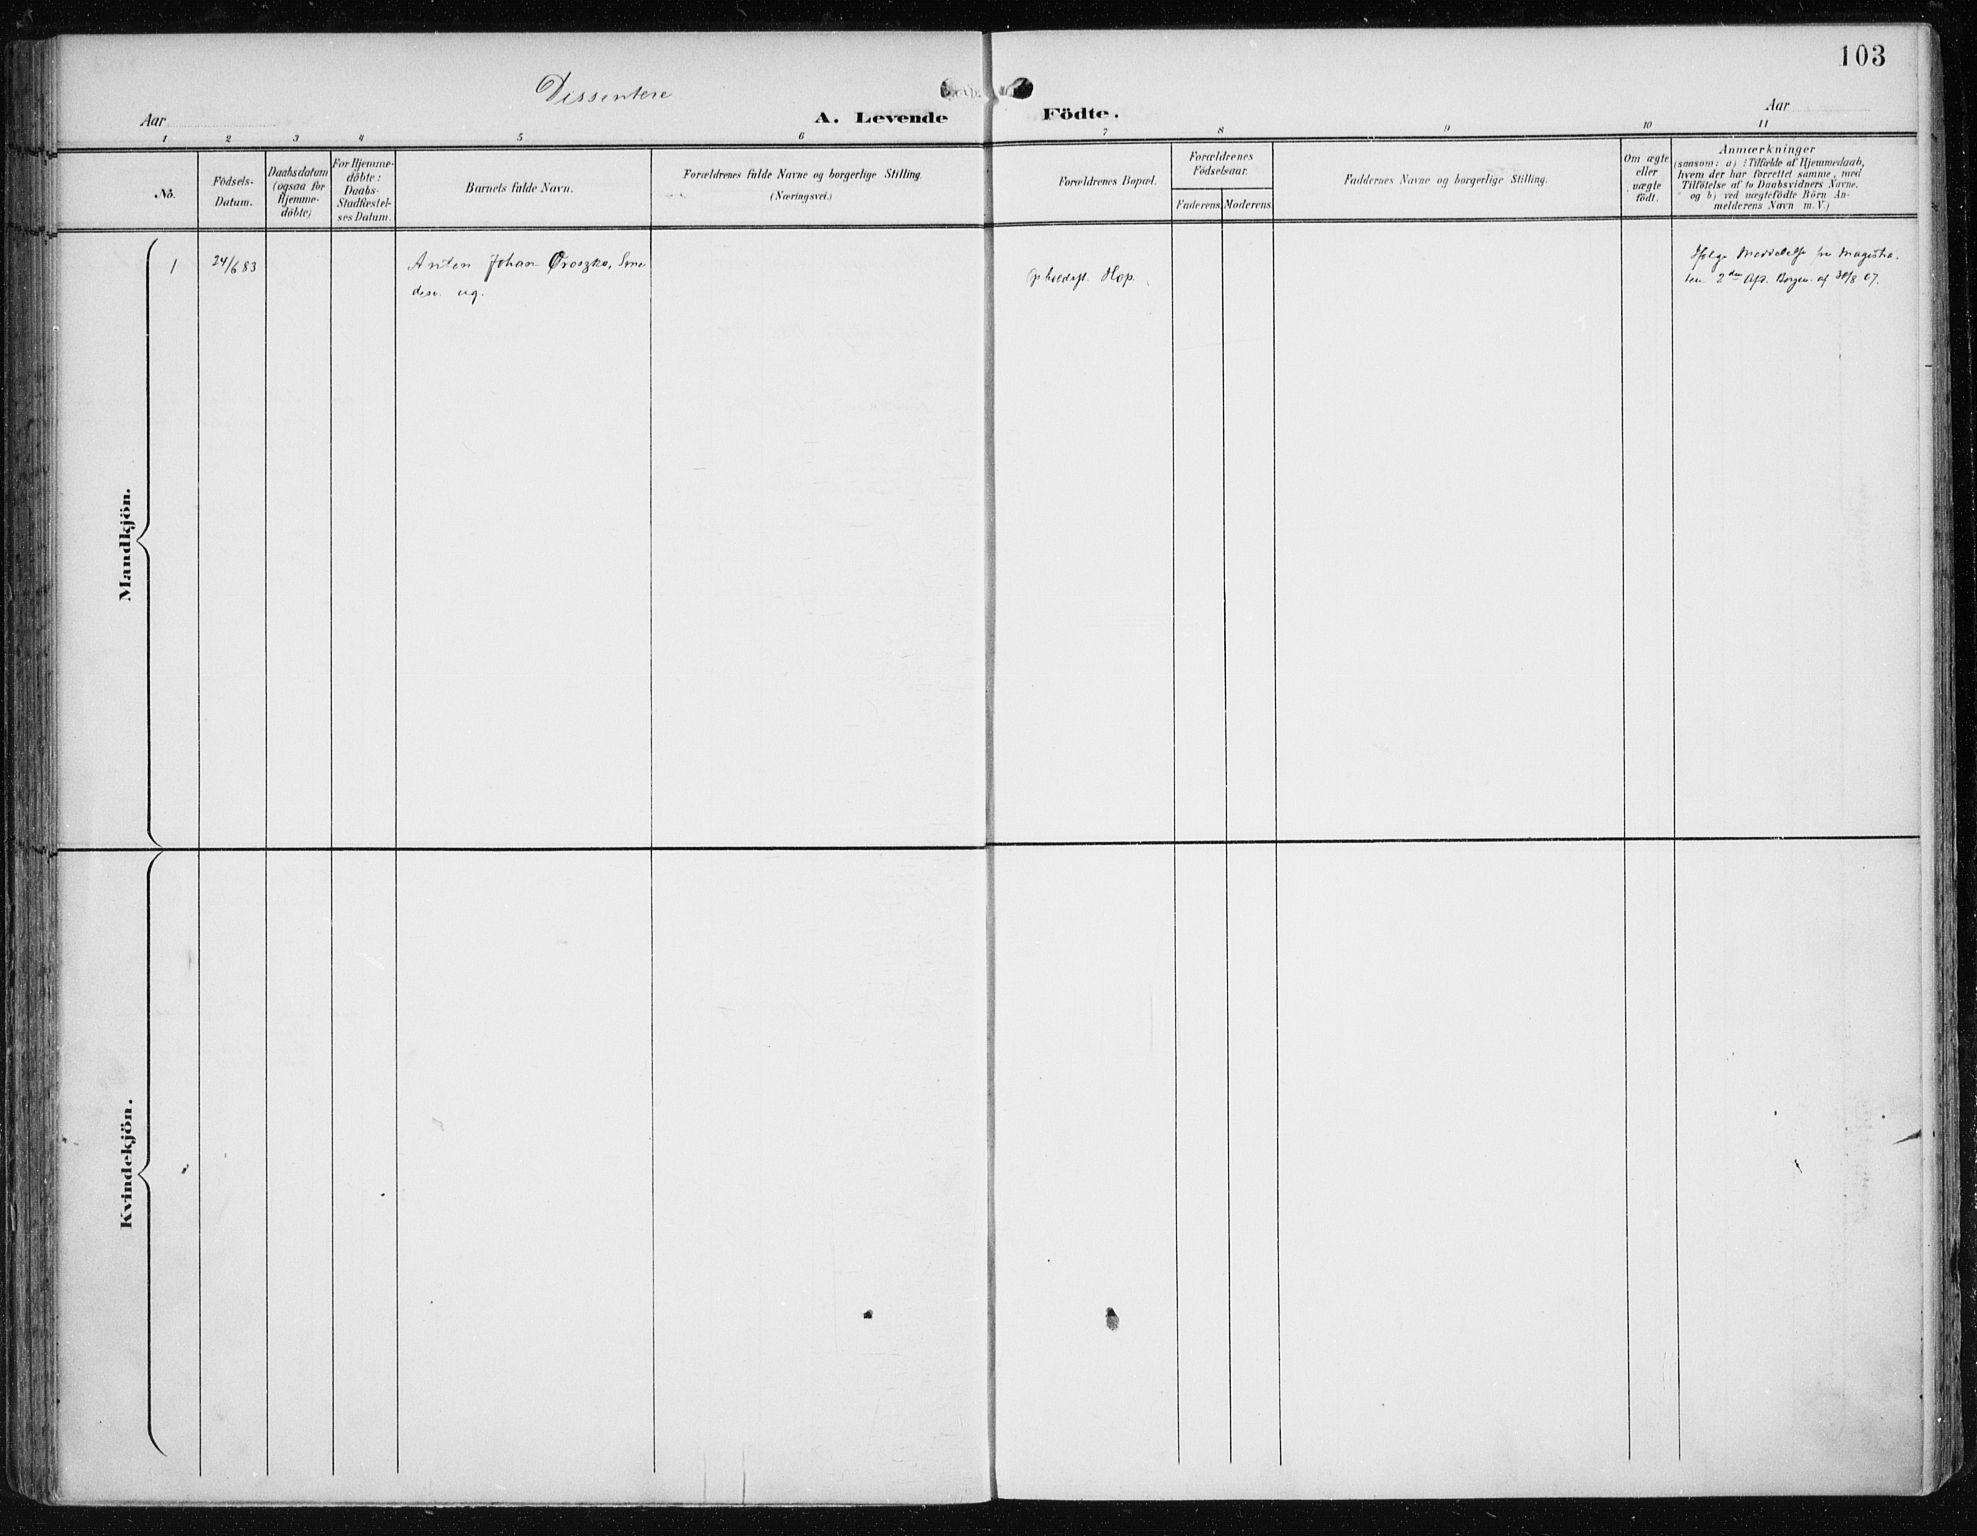 SAB, Fana Sokneprestembete, H/Haa/Haai/L0003: Ministerialbok nr. I 3, 1900-1912, s. 103